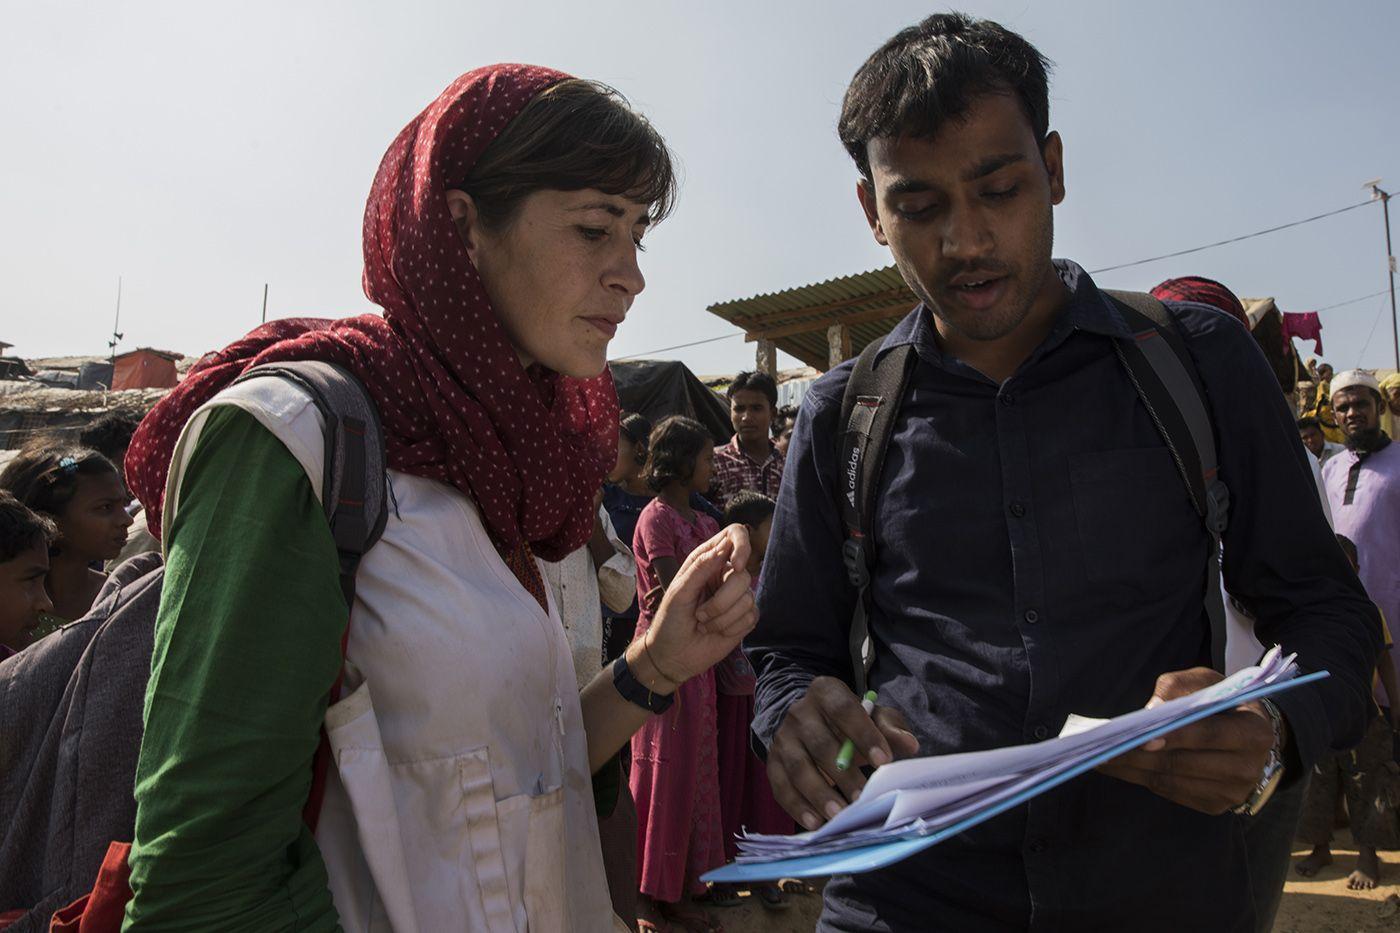 María Jo´se Rohingya exodo. Gonzalo Martínez.jpg